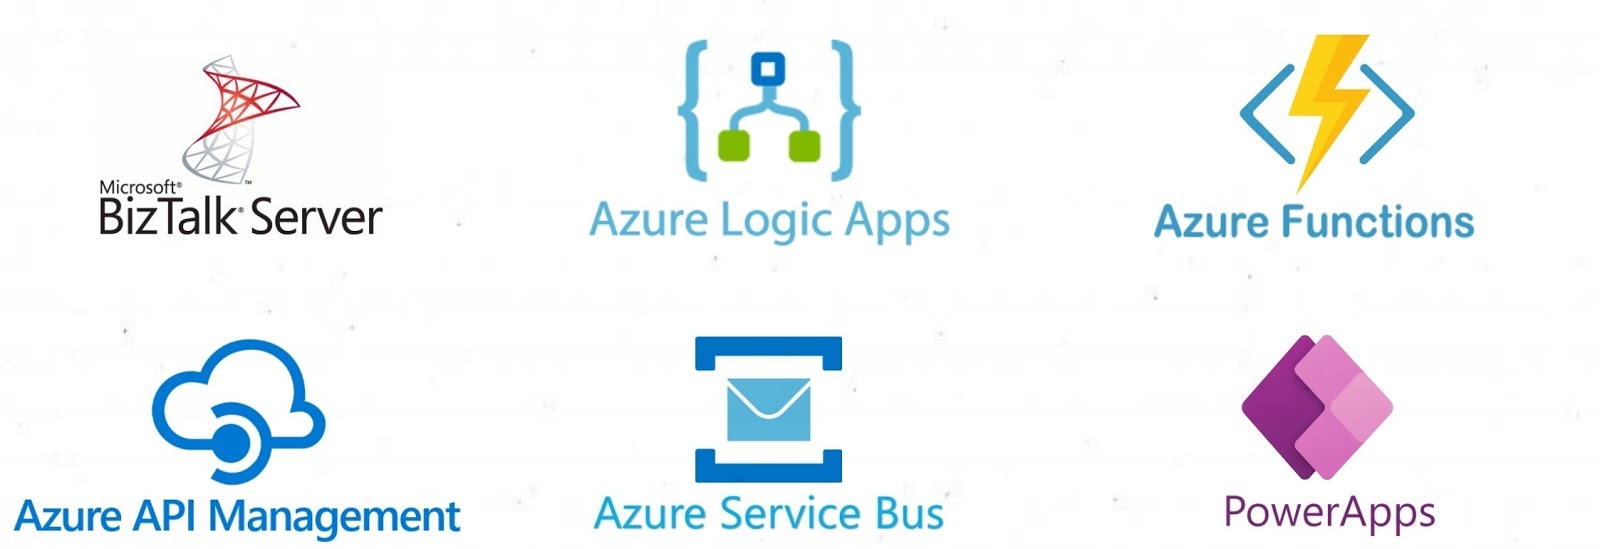 August 23, 2021 Weekly Update on Microsoft Integration Platform & Azure iPaaS